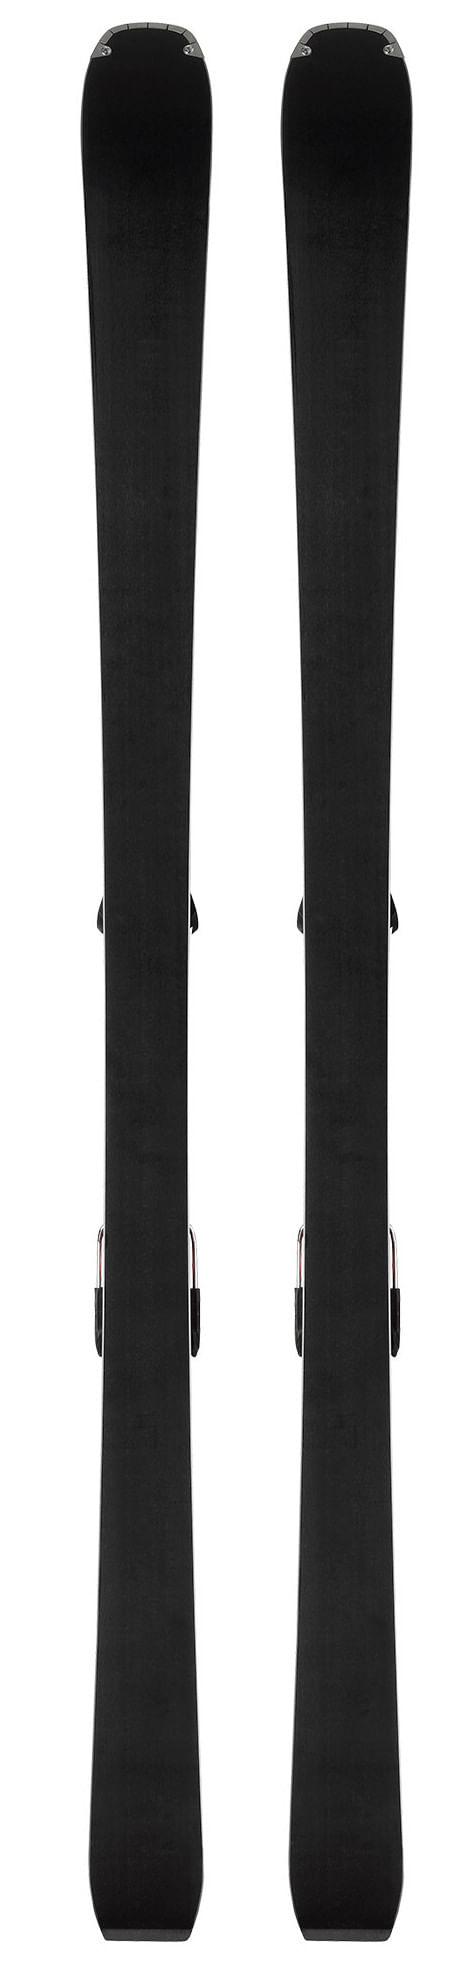 Atomic-Vantage-75-C-Skis-With-M10-GW-Bindings-2021